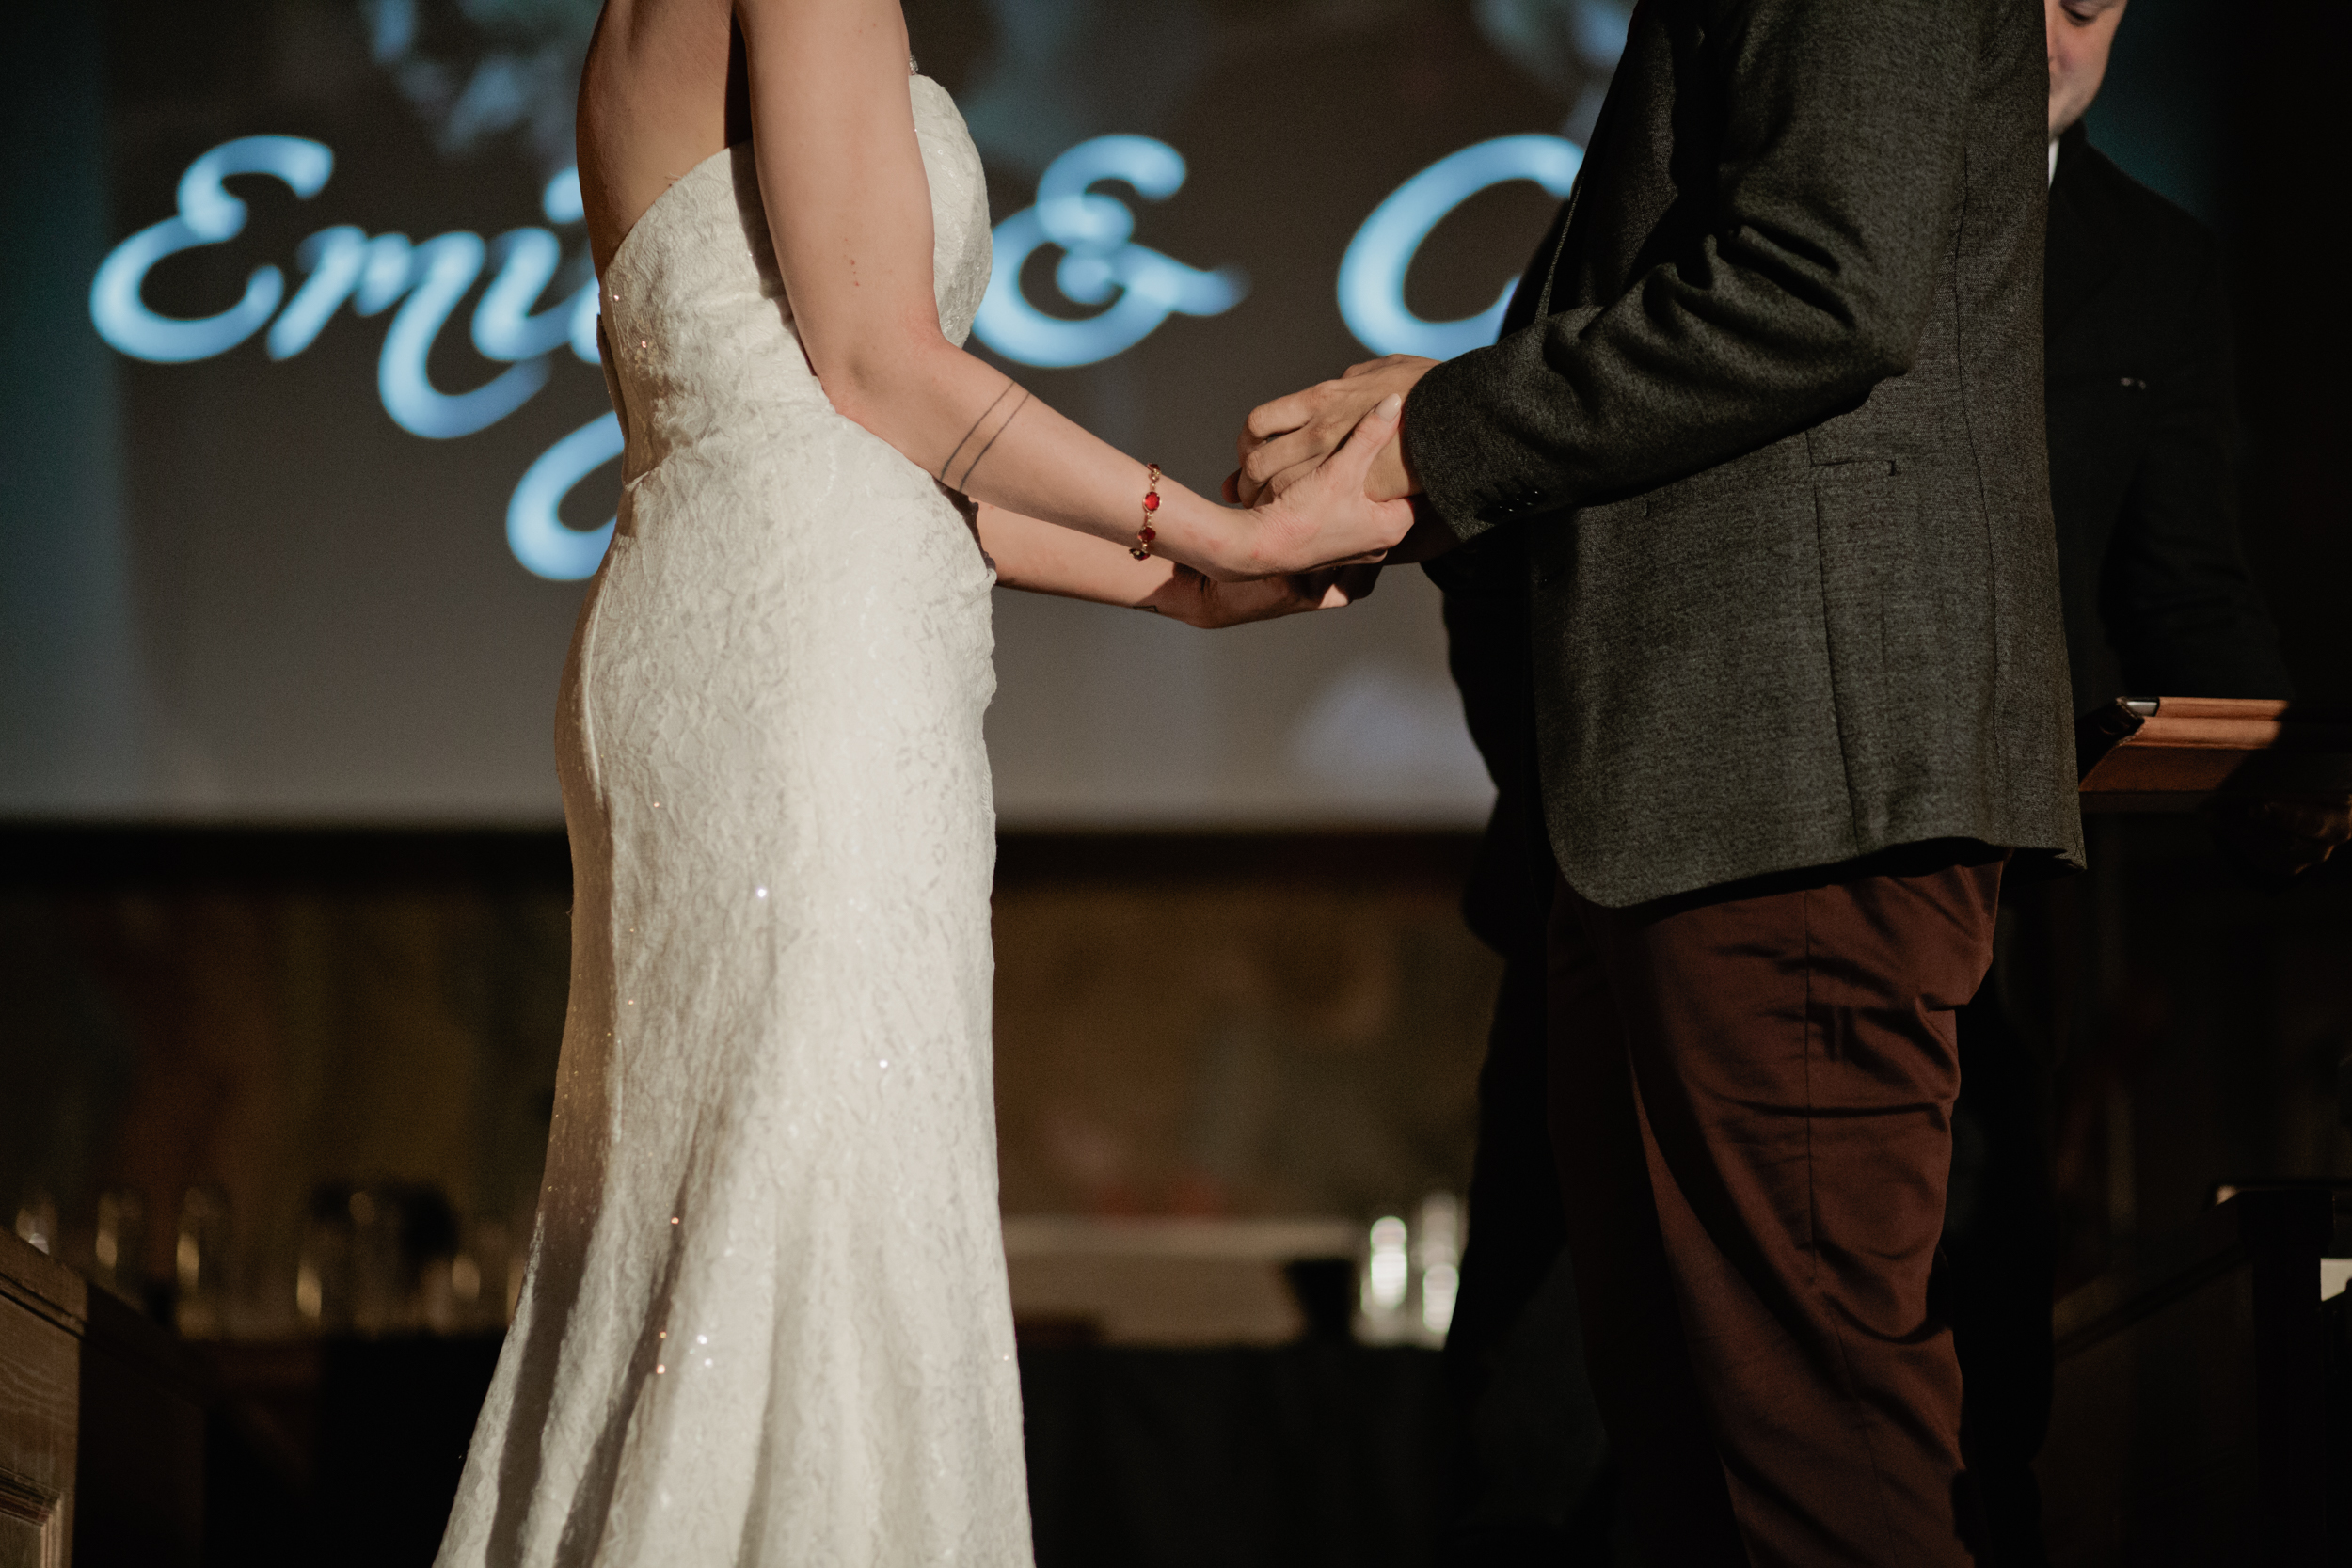 providence-wedding-photographer-97.jpg